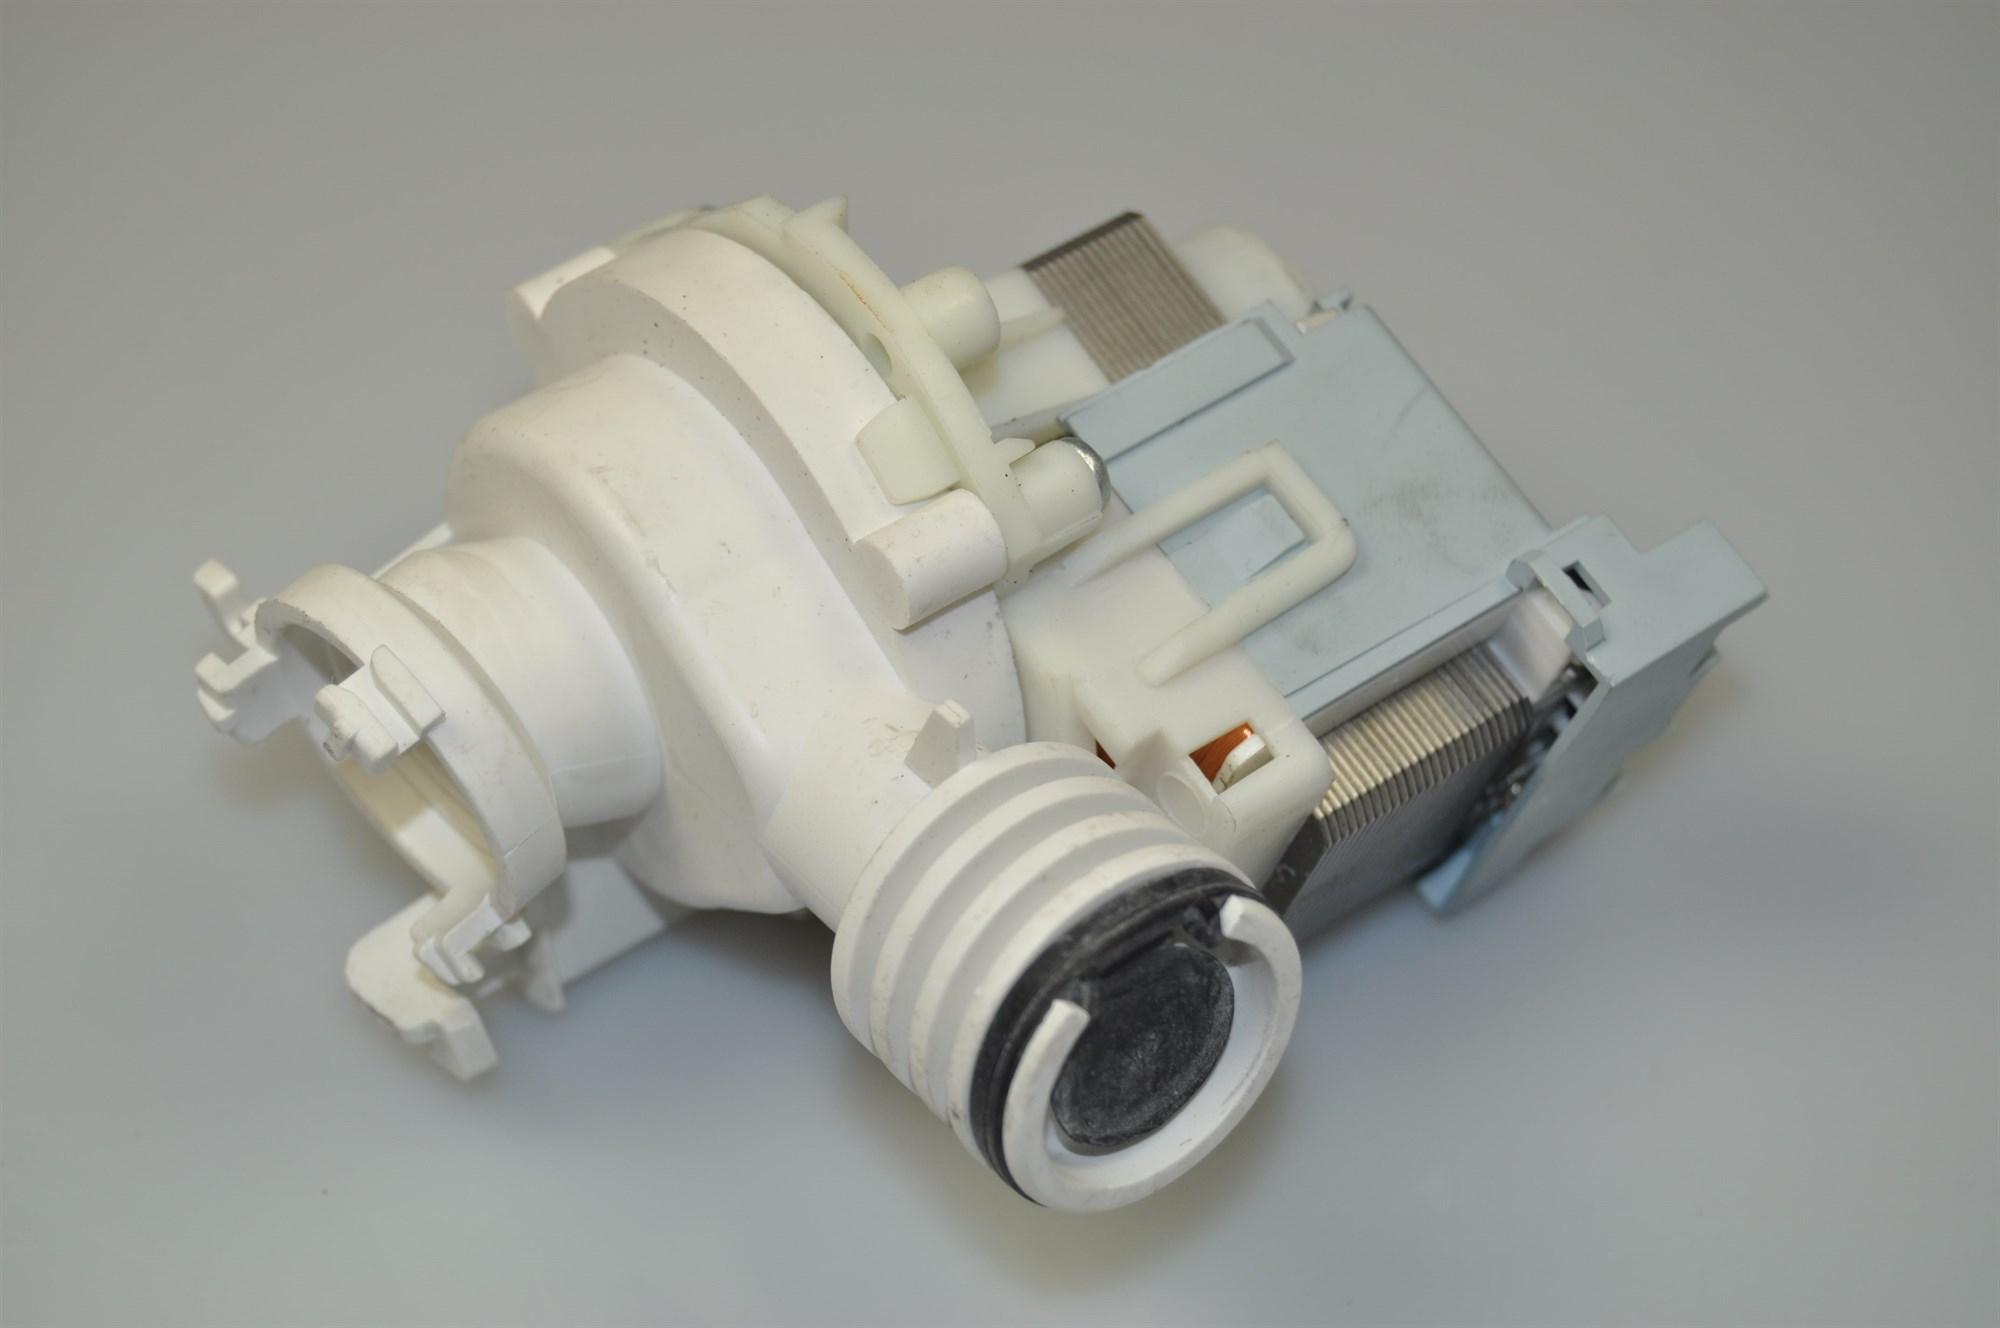 Drain Pump Ariston Dishwasher